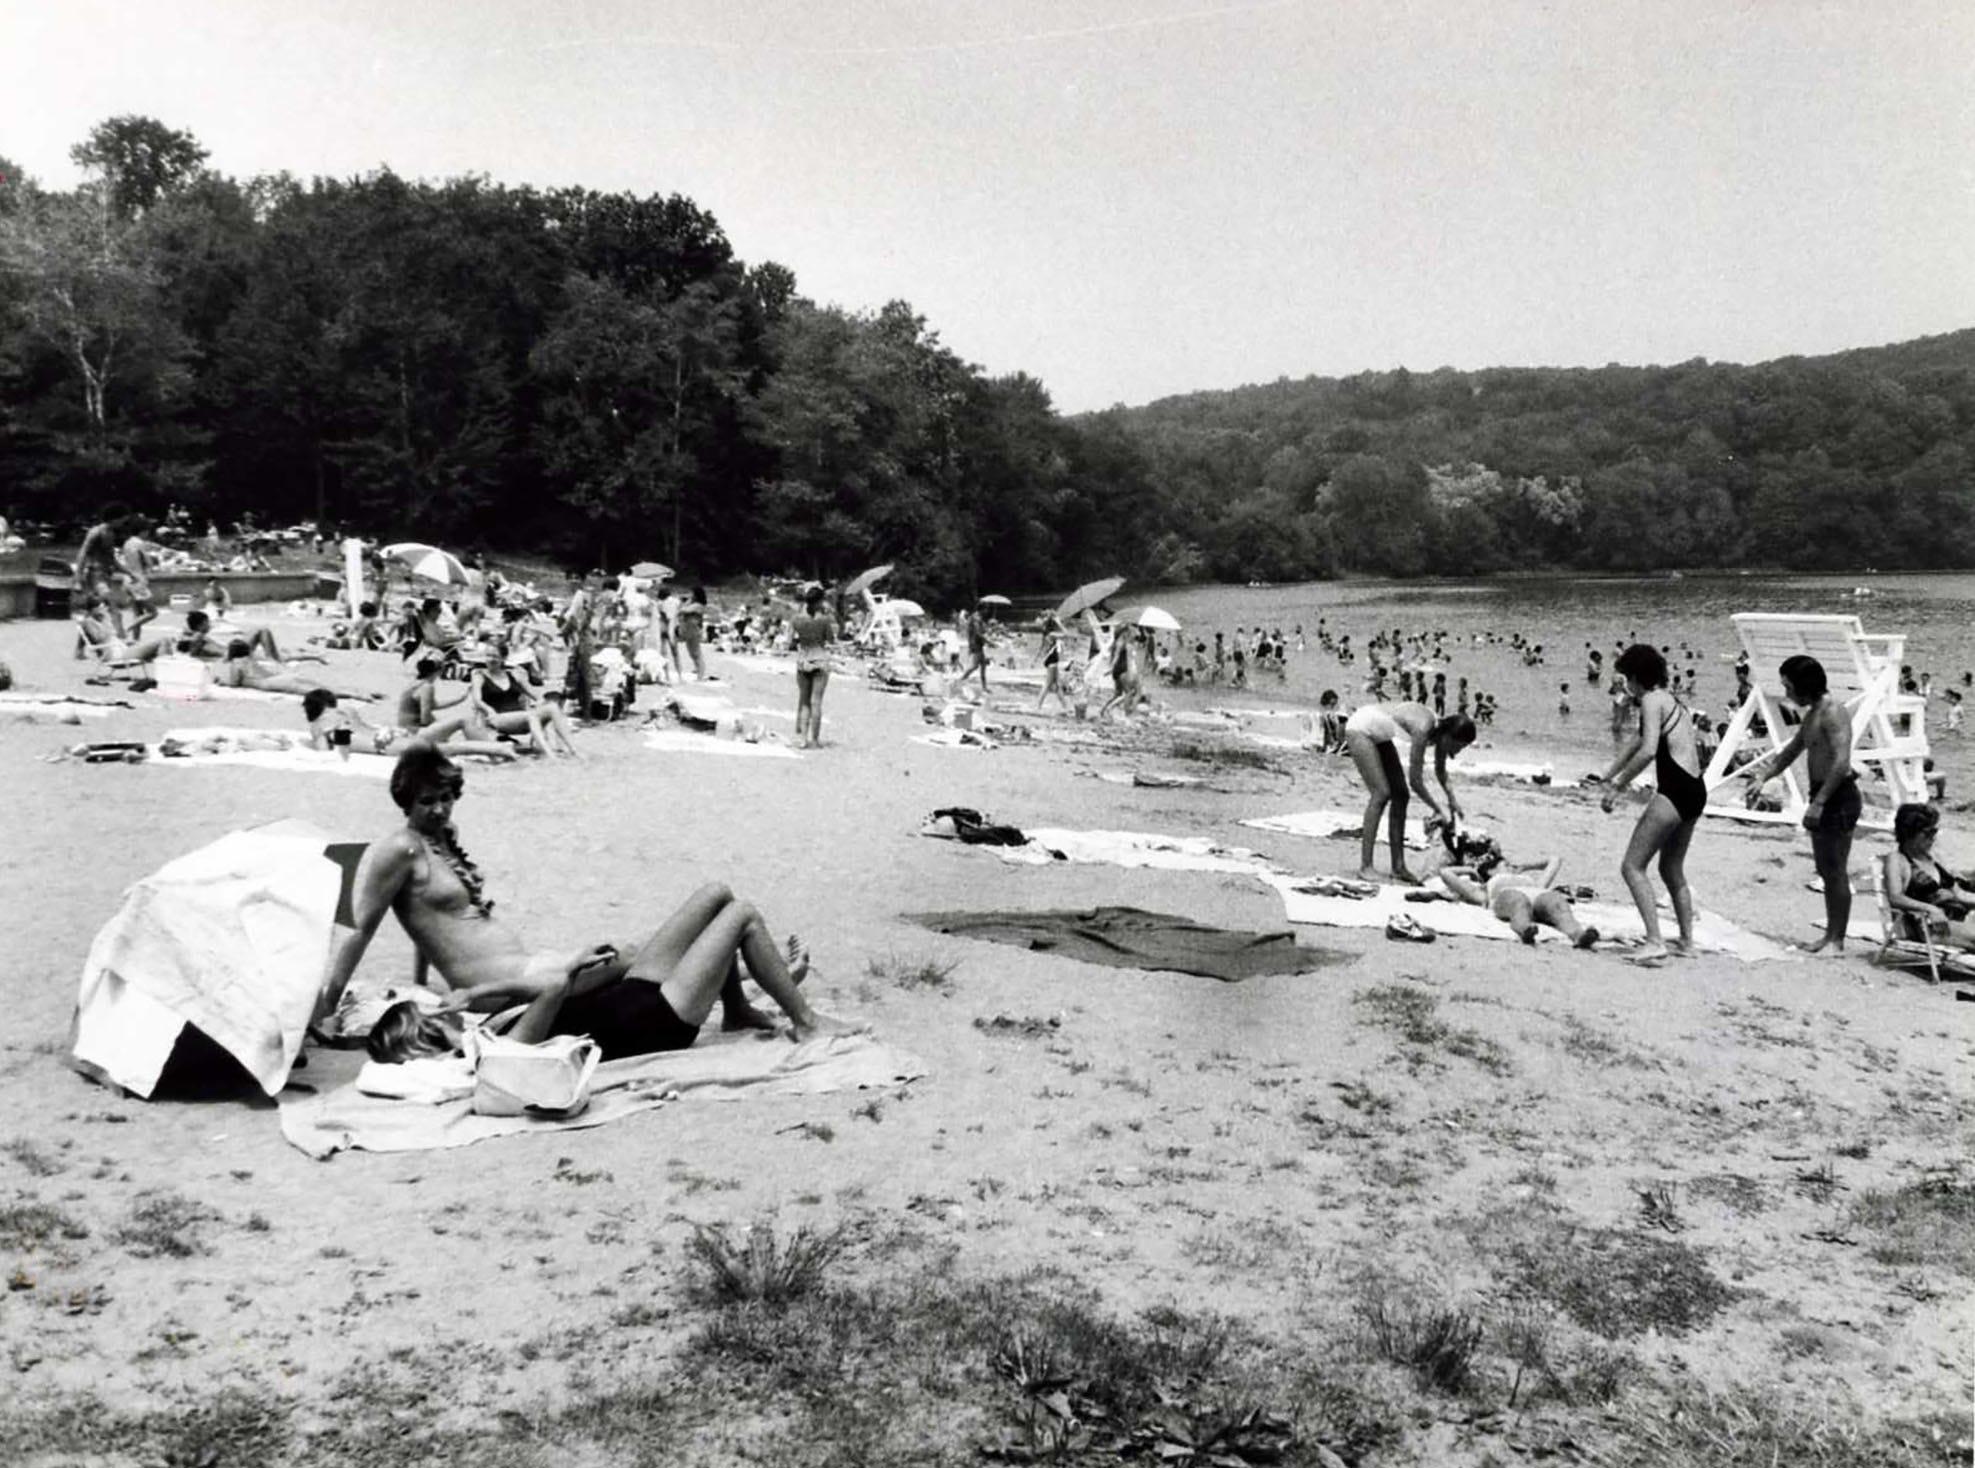 July 1978: Ringwood State Park